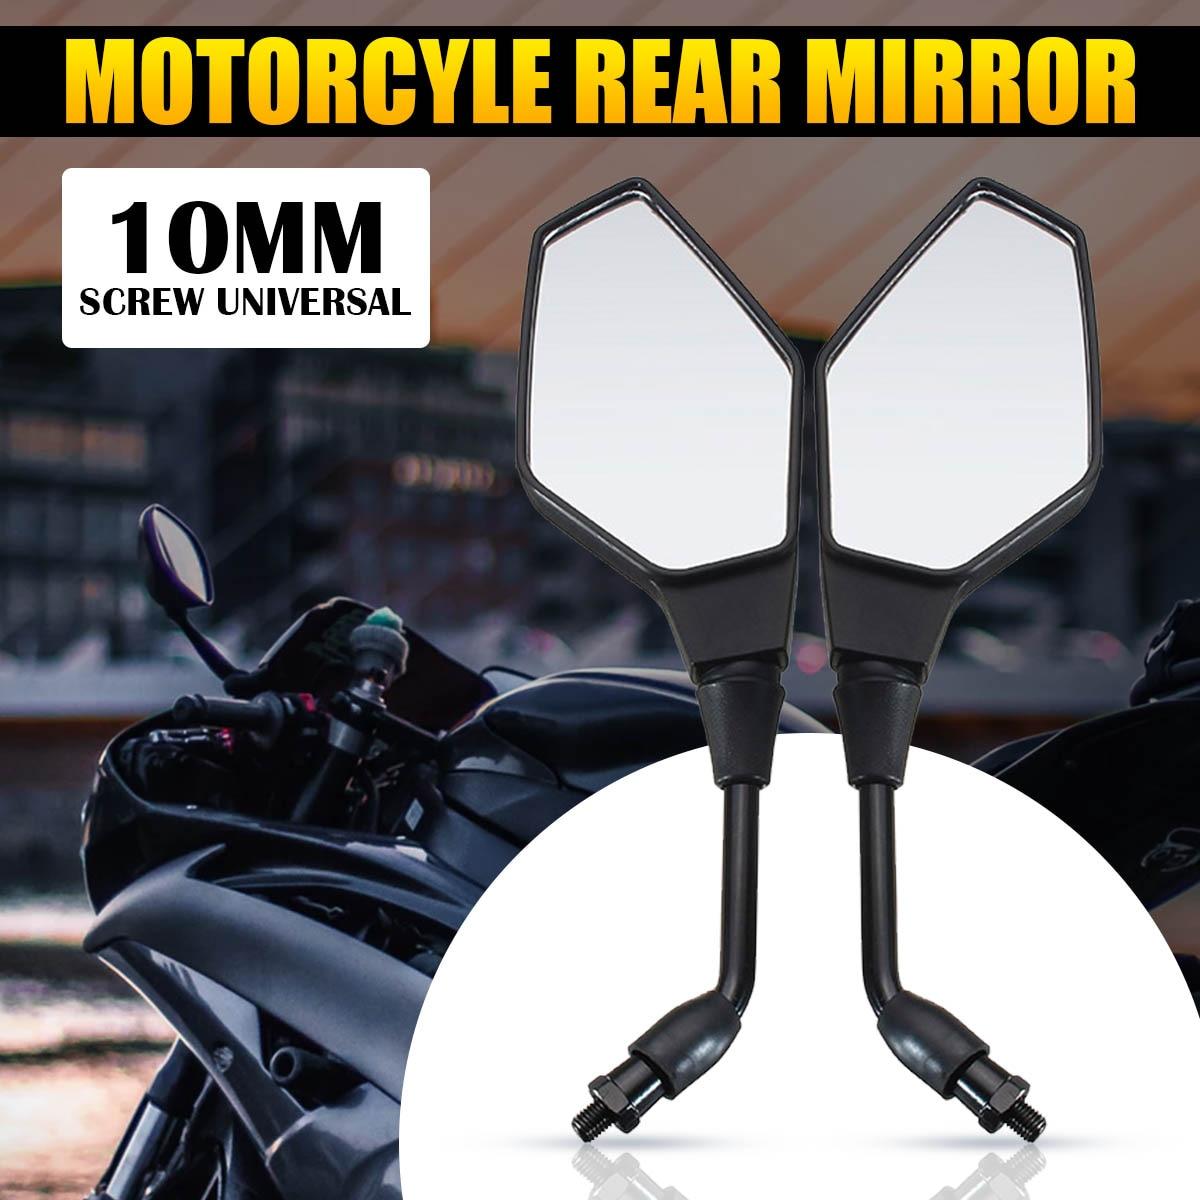 Mofaner 10MM Motorcycle Handlebar Rear View Side Mirror Rearview Mirrors Universal For Honda/Kawasaki/Yamaha/Suzuki/KTM Black